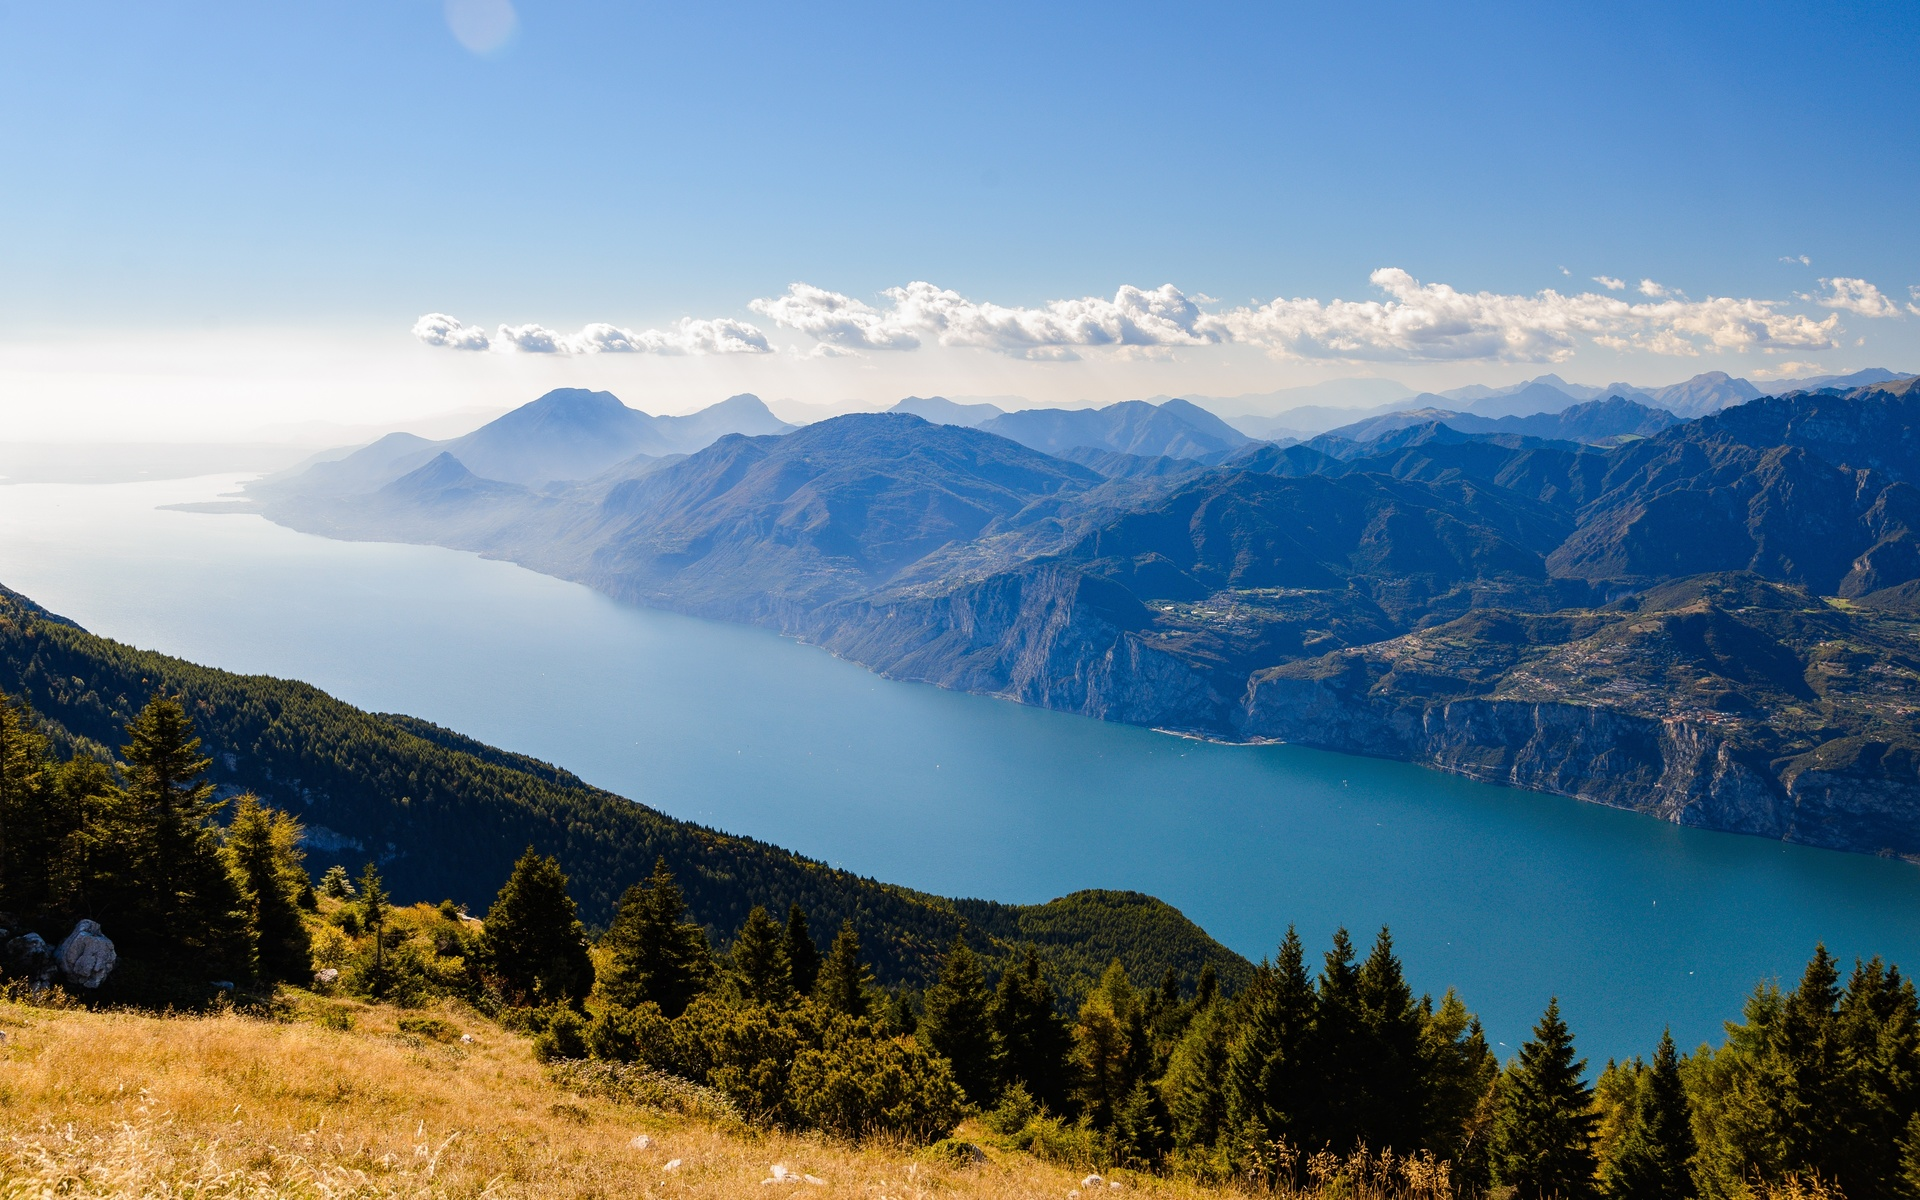 италия, озеро, italy, супер фото, природа, горы